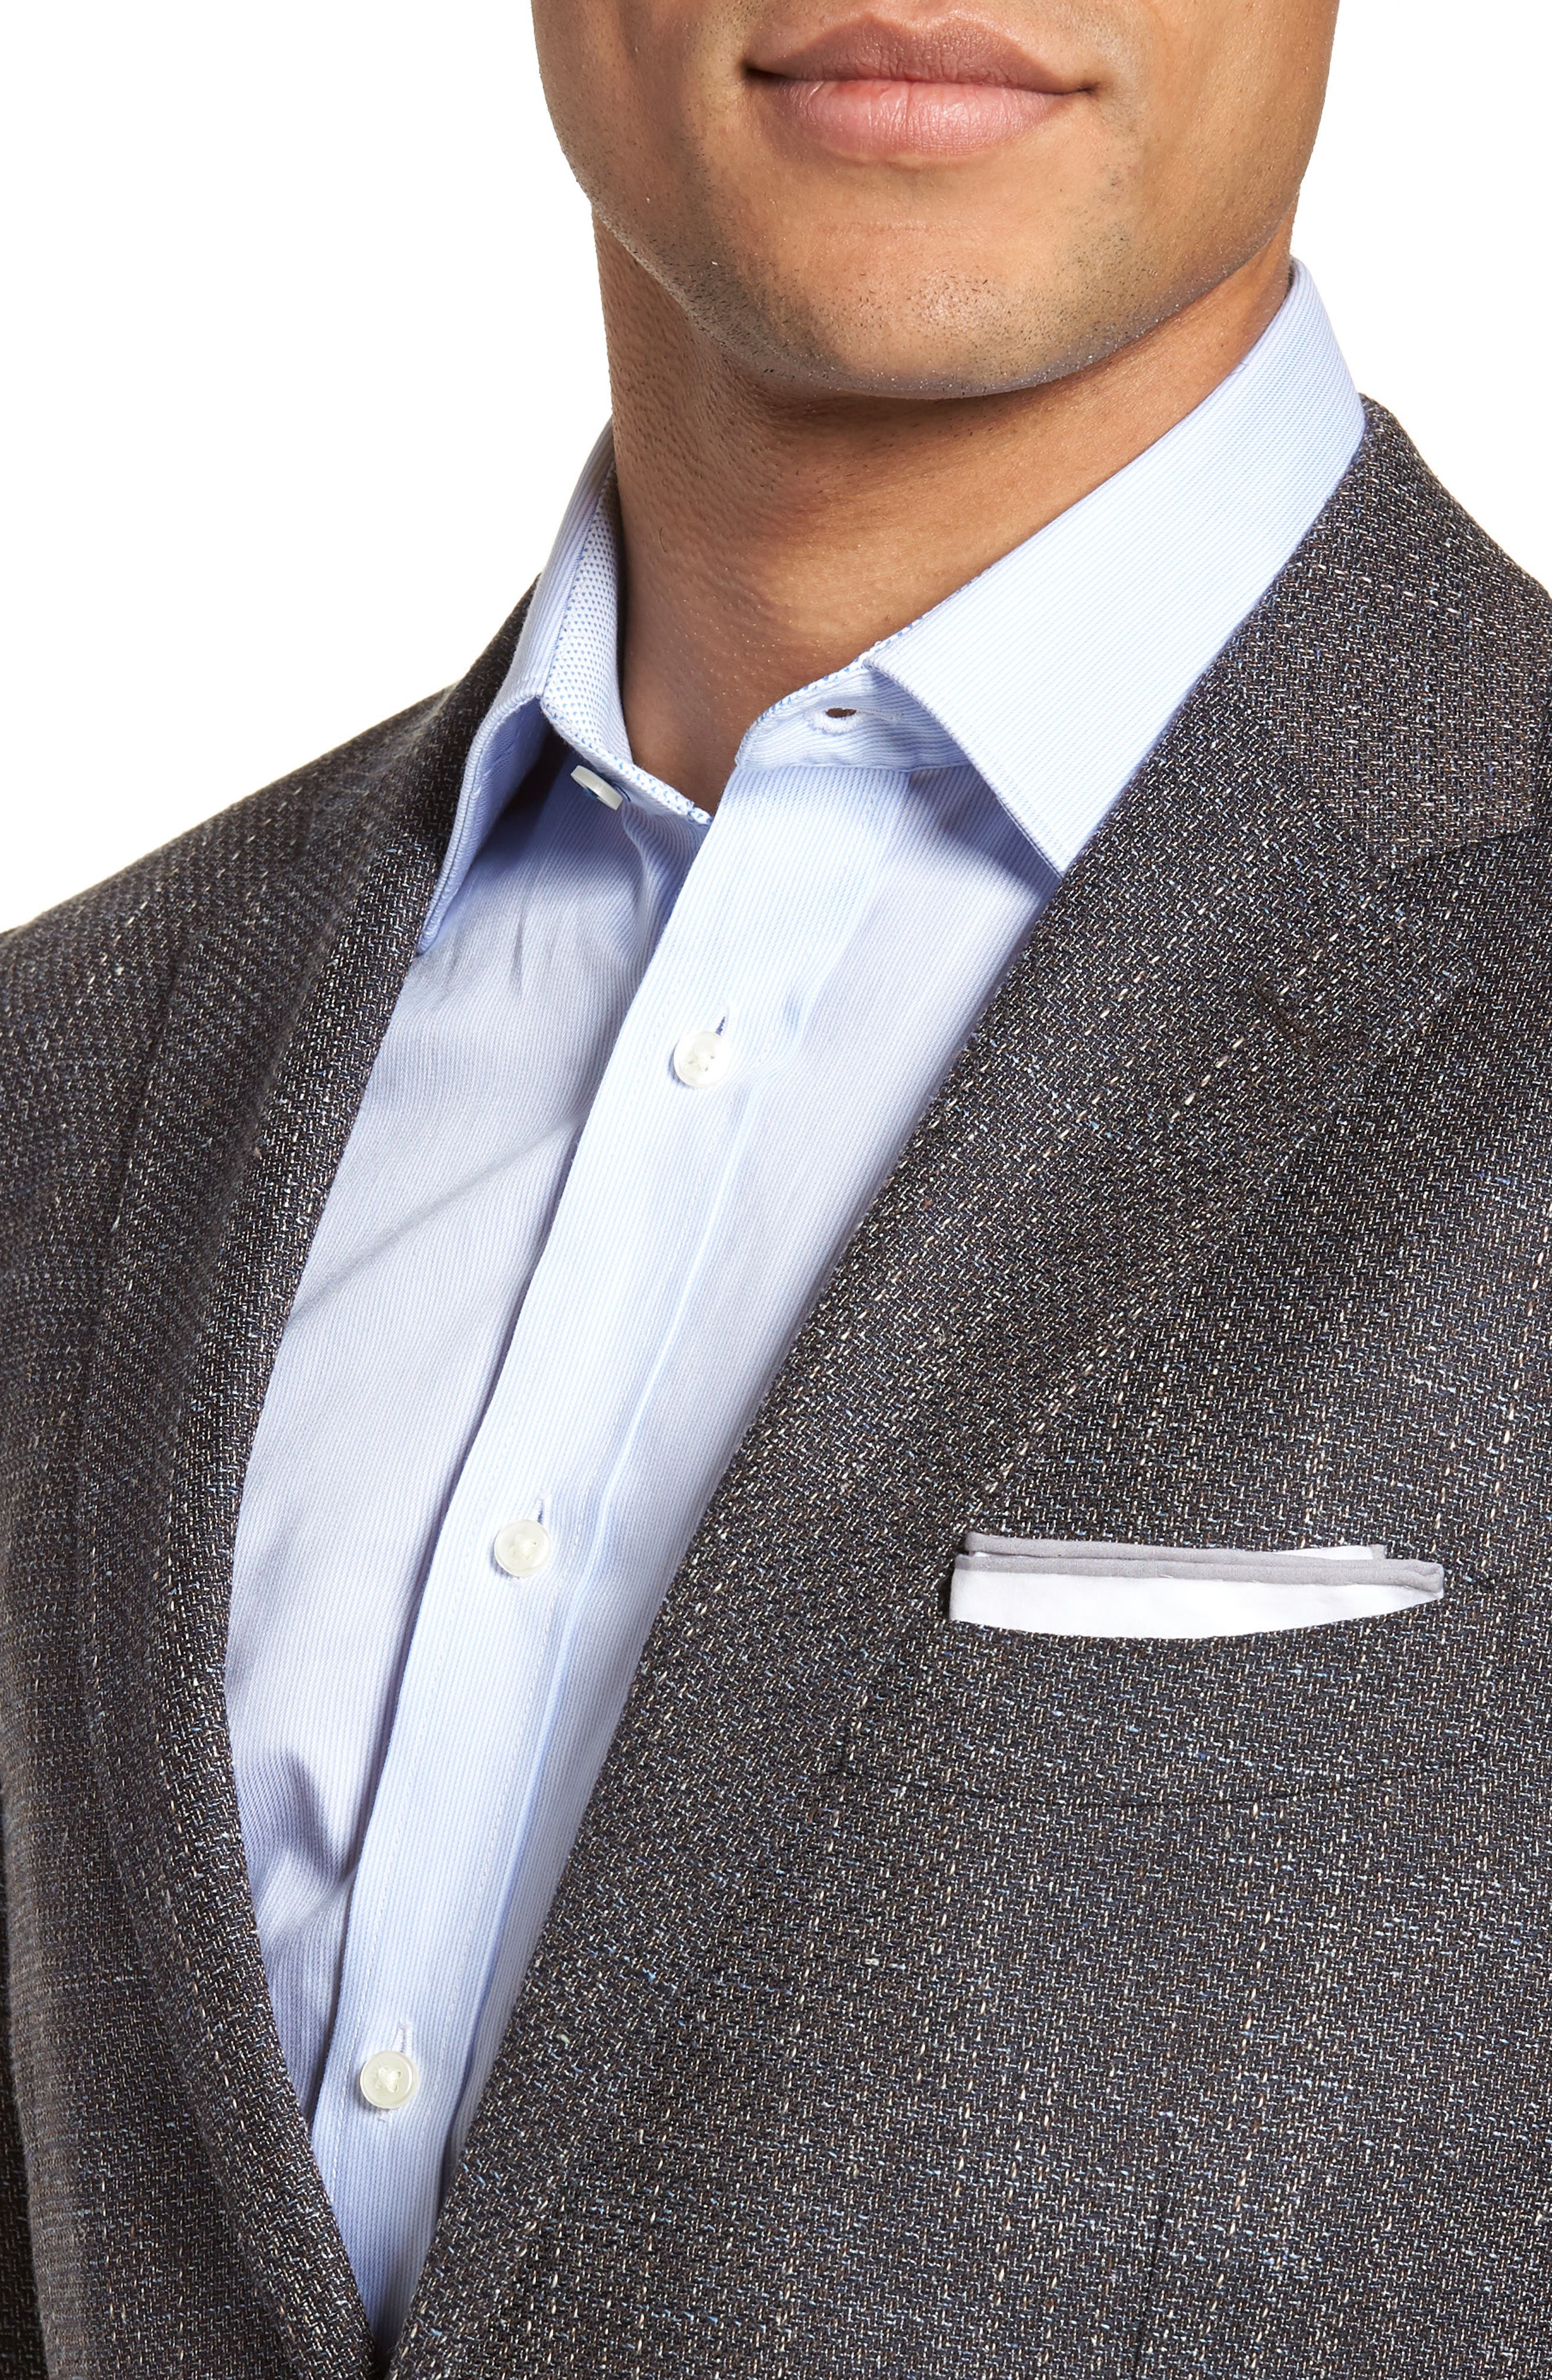 Five Bridges Slim Fit Tweed Sport Coat,                             Alternate thumbnail 4, color,                             800